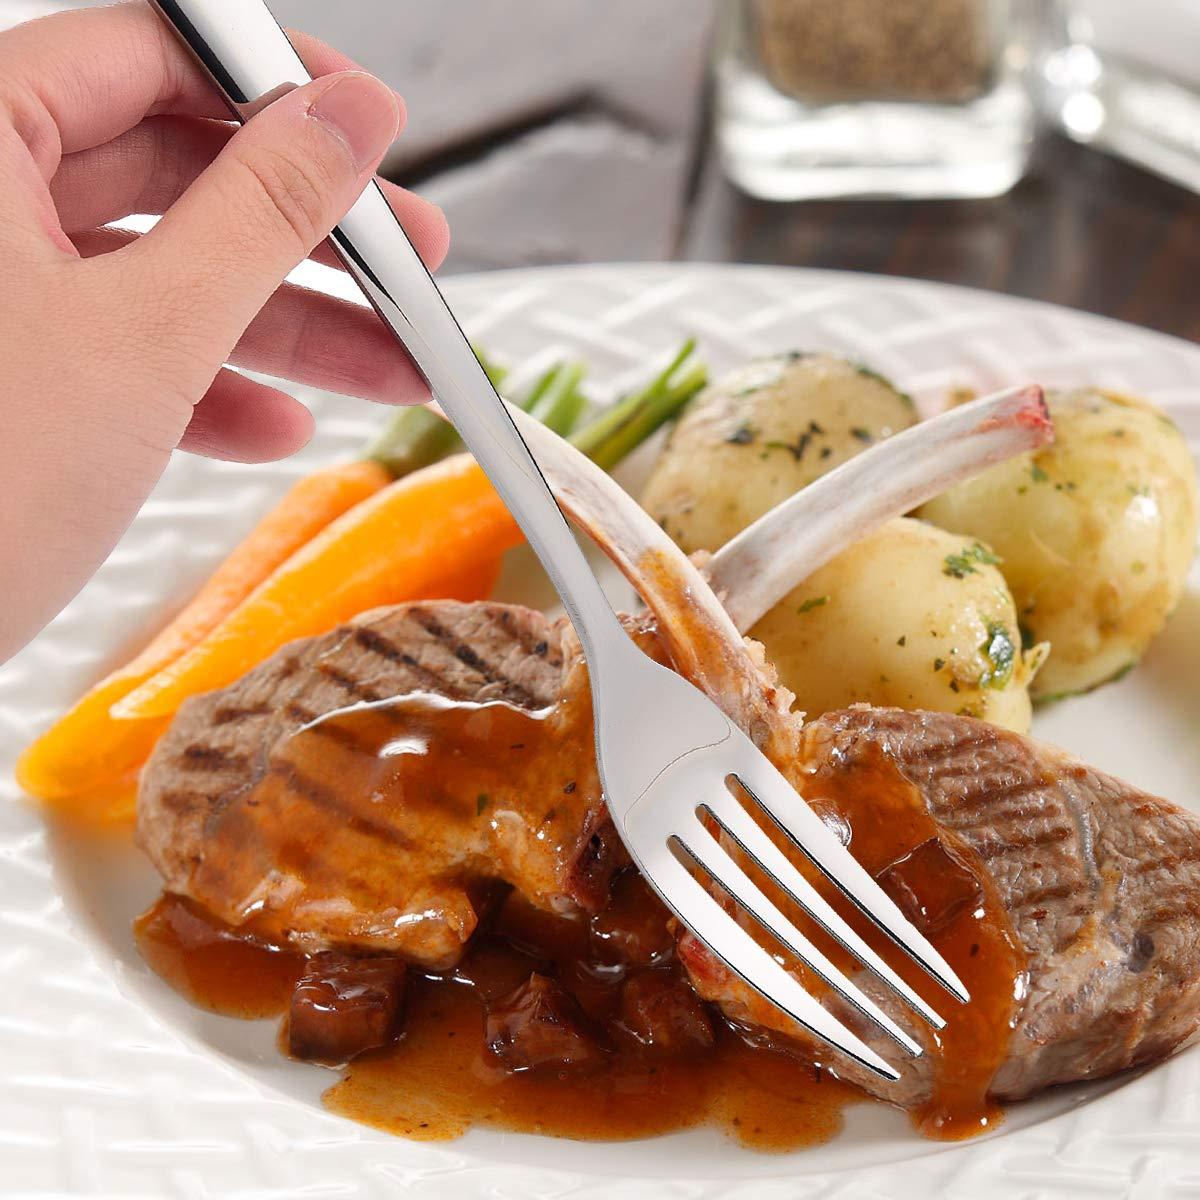 8 inches /… PINK Elegant Life 12-Piece Stainless Steel Forks Set Mirror Polished Modern Flatware Cutlery Forks for Kitchen Dinner Forks